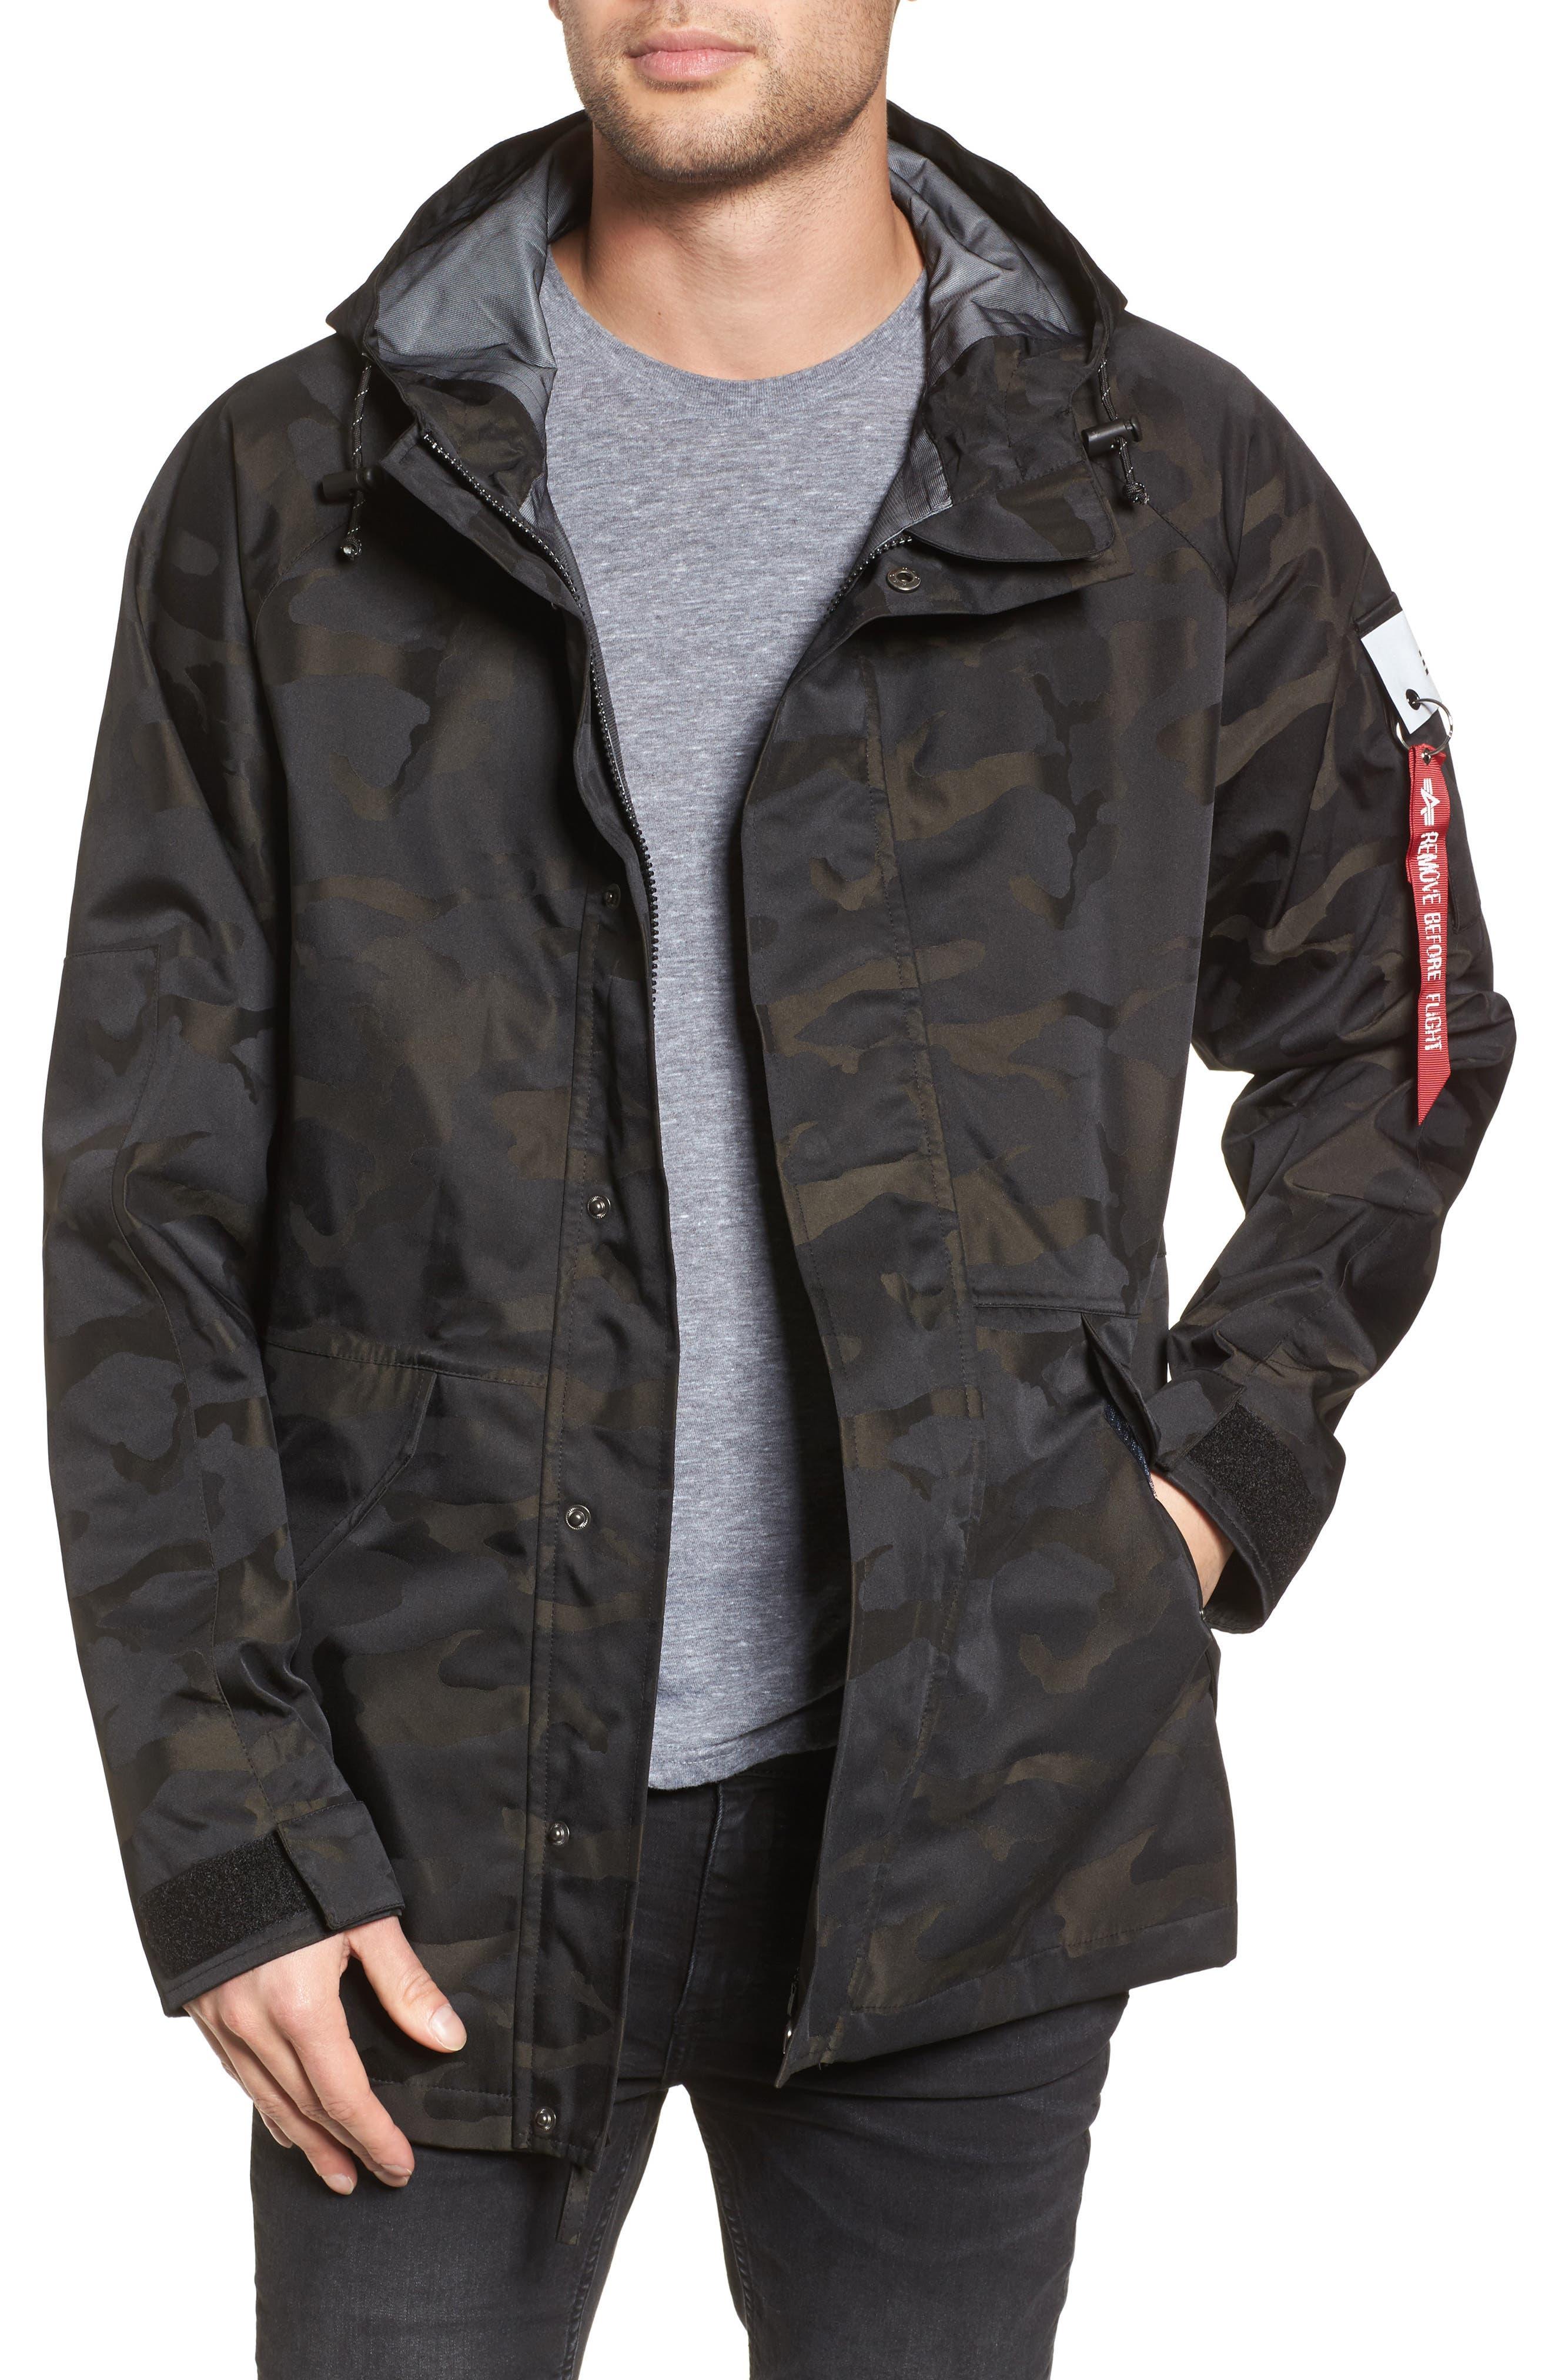 Torrent Camo Jacket,                             Main thumbnail 1, color,                             001